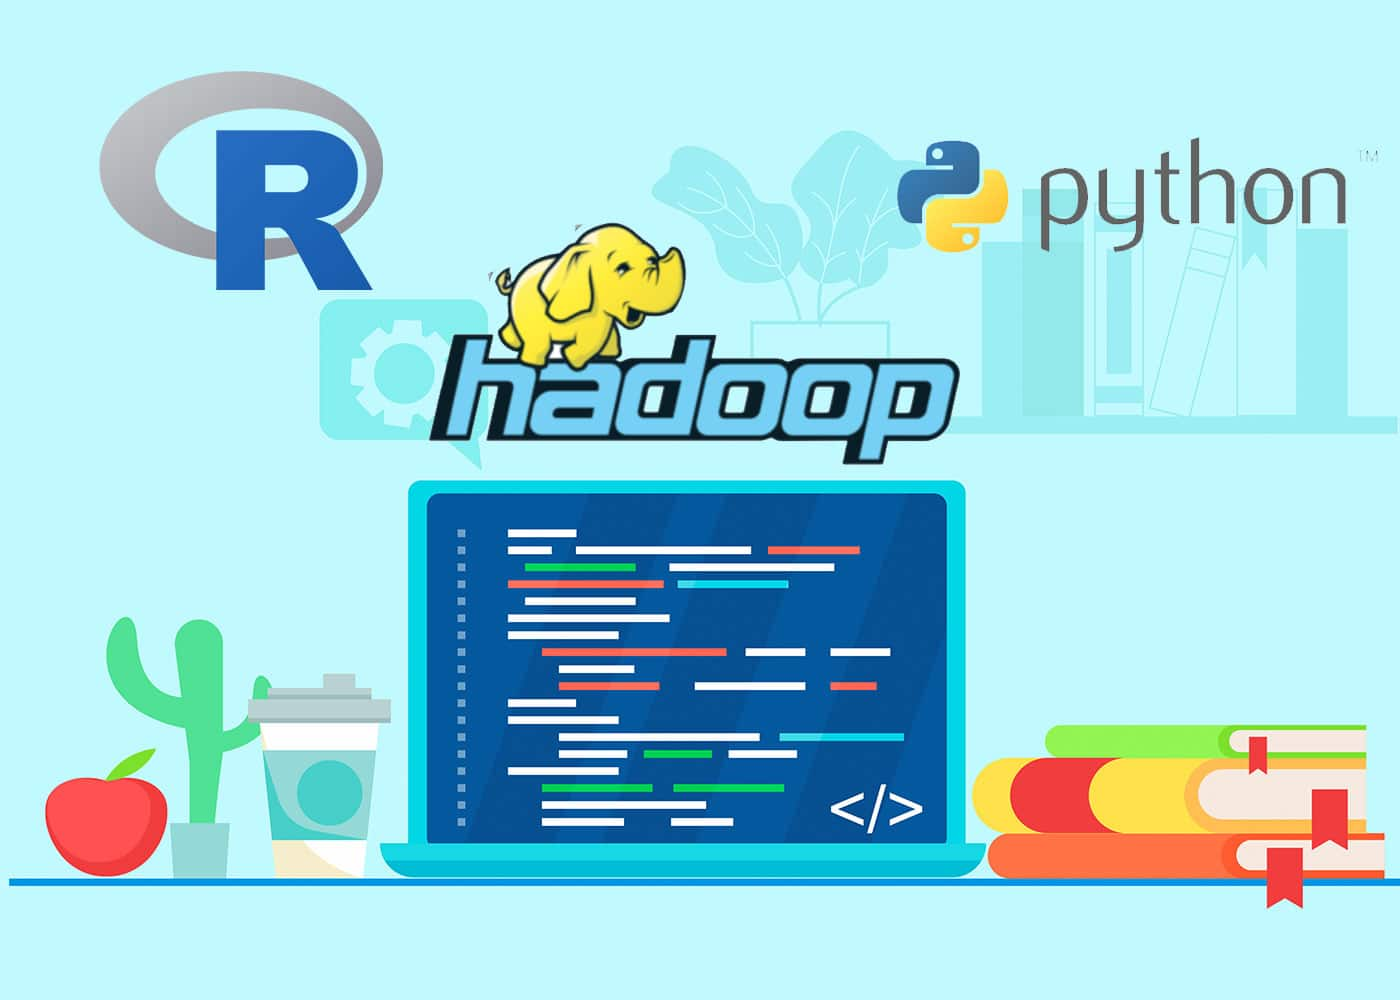 R Programming, Hadoop, Python